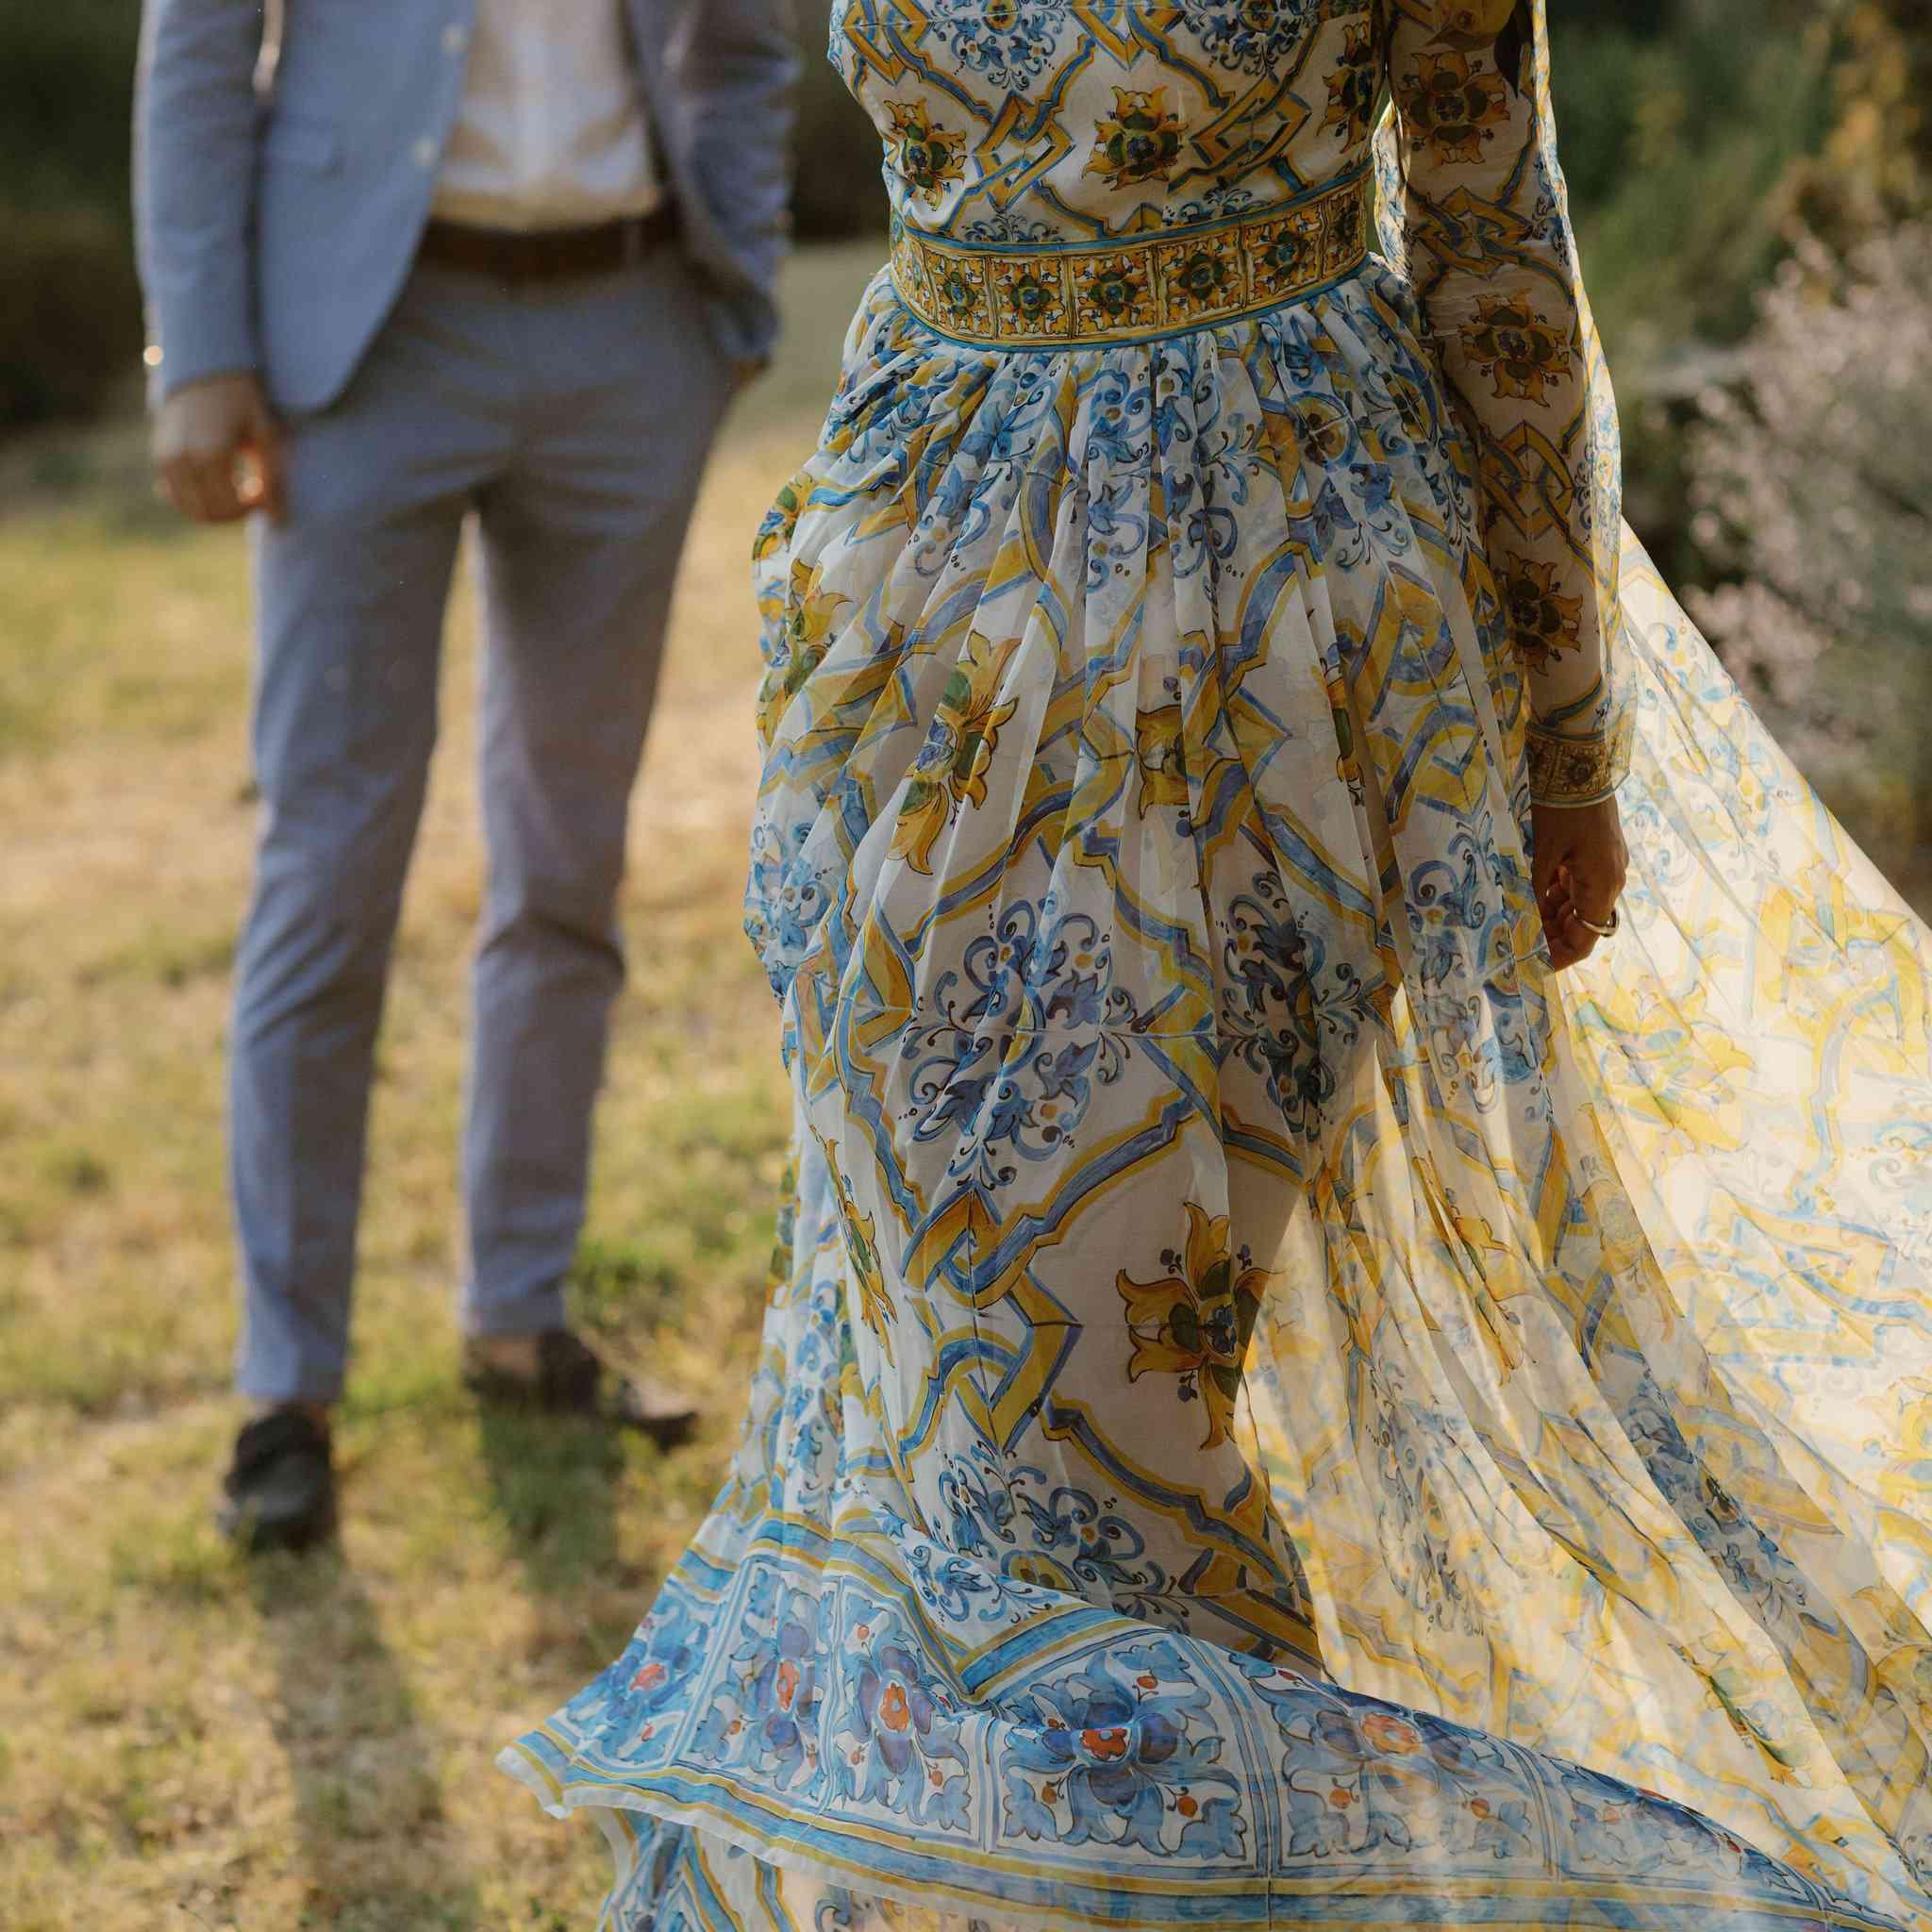 Closeup of bride's dress